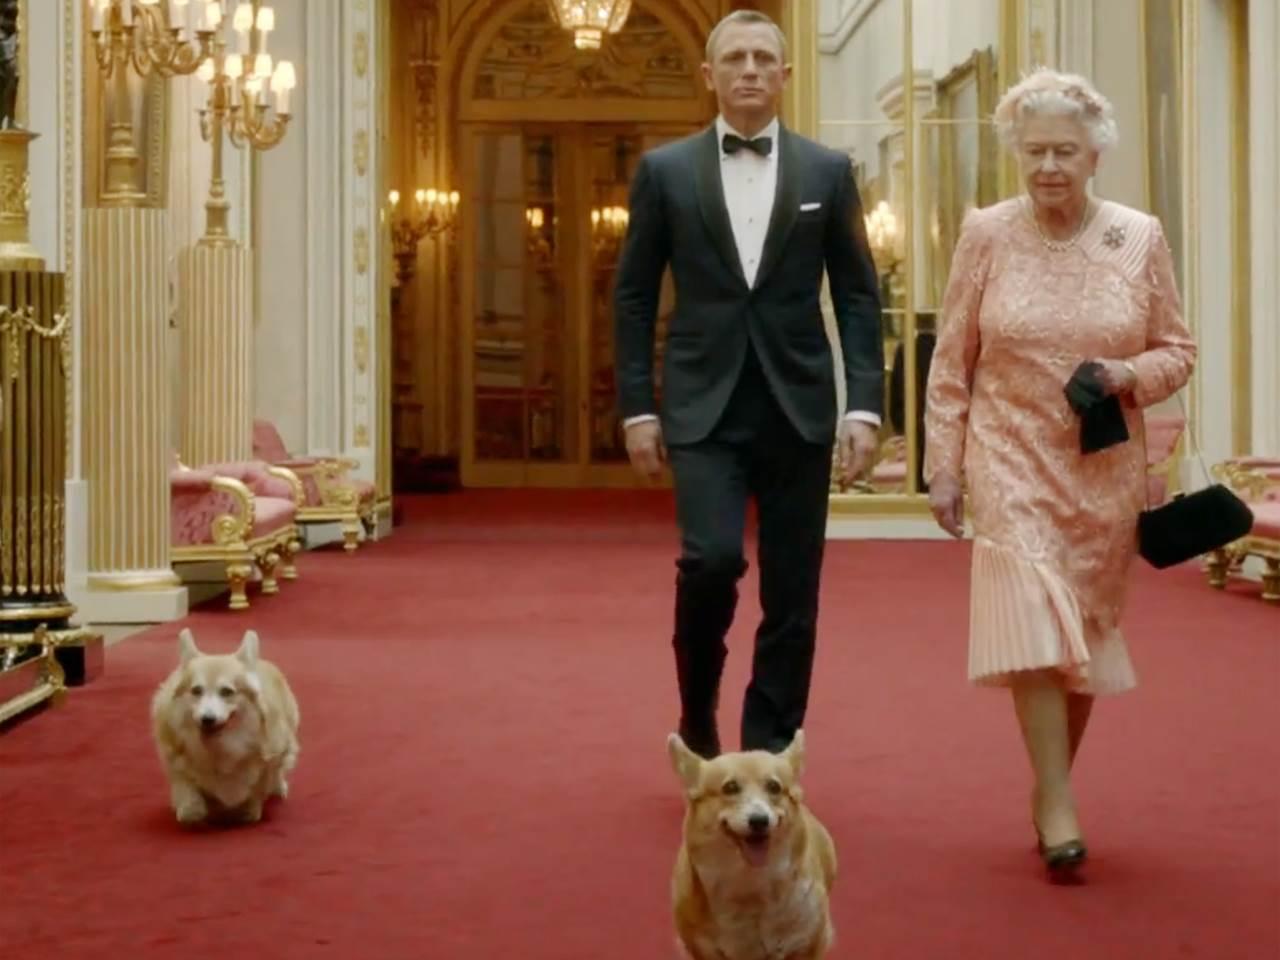 The Queen and Daniel Craig